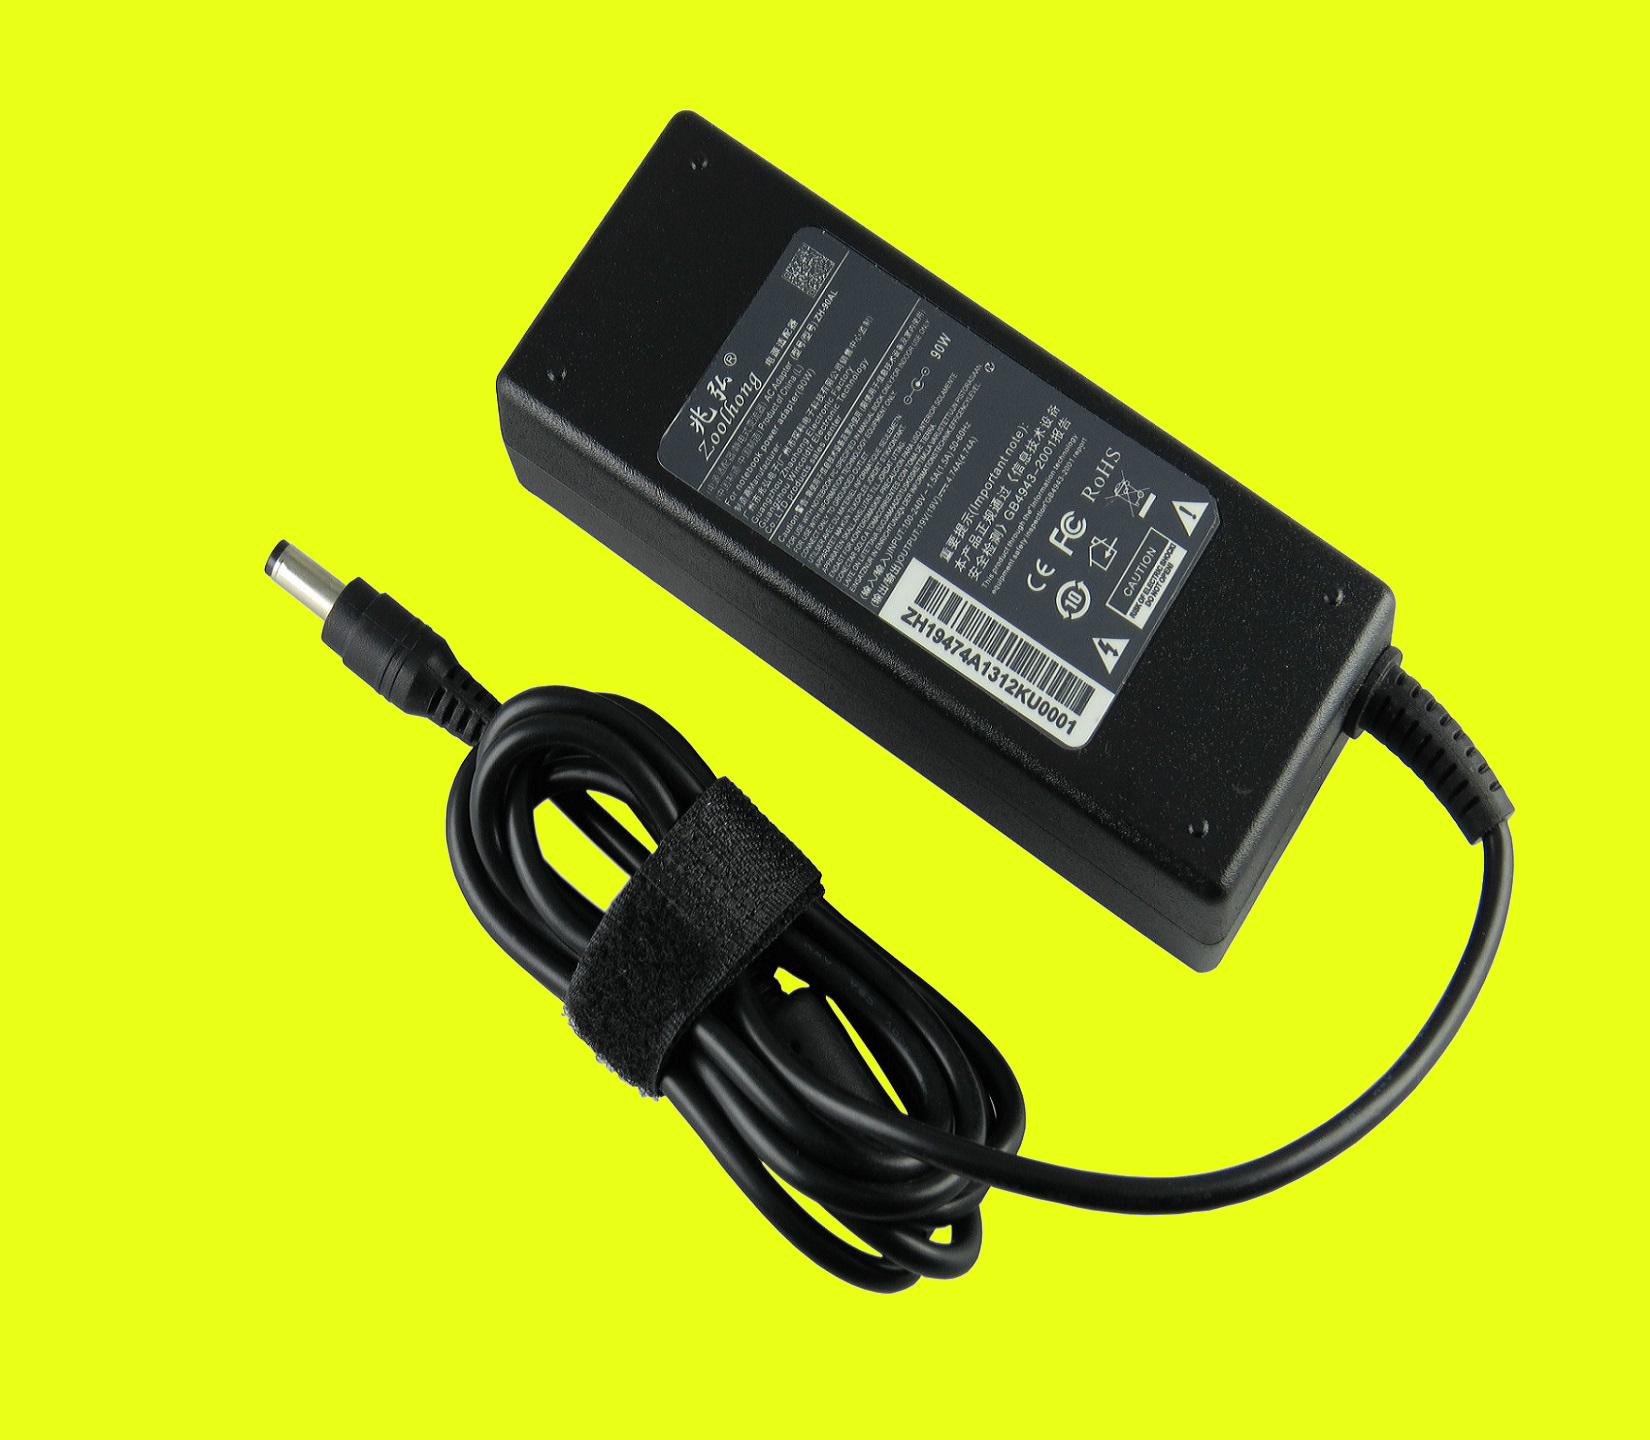 shoppi - Chargeur pour PC Portable HP - 19V - 4.74A / 90W